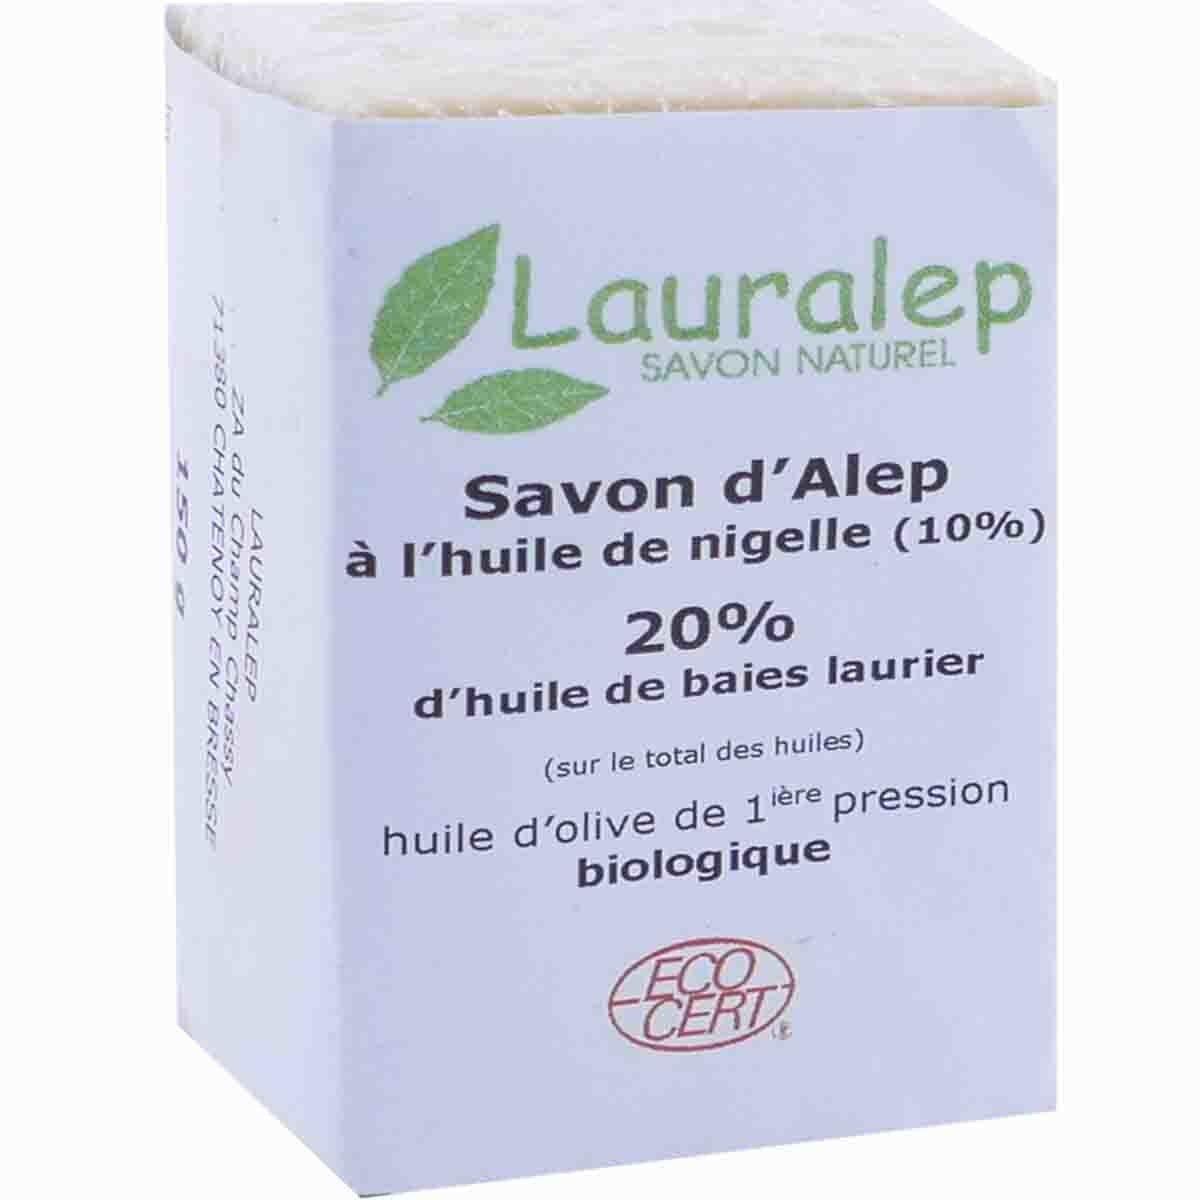 Lauralep savon d'alep huile de nigelle 150g